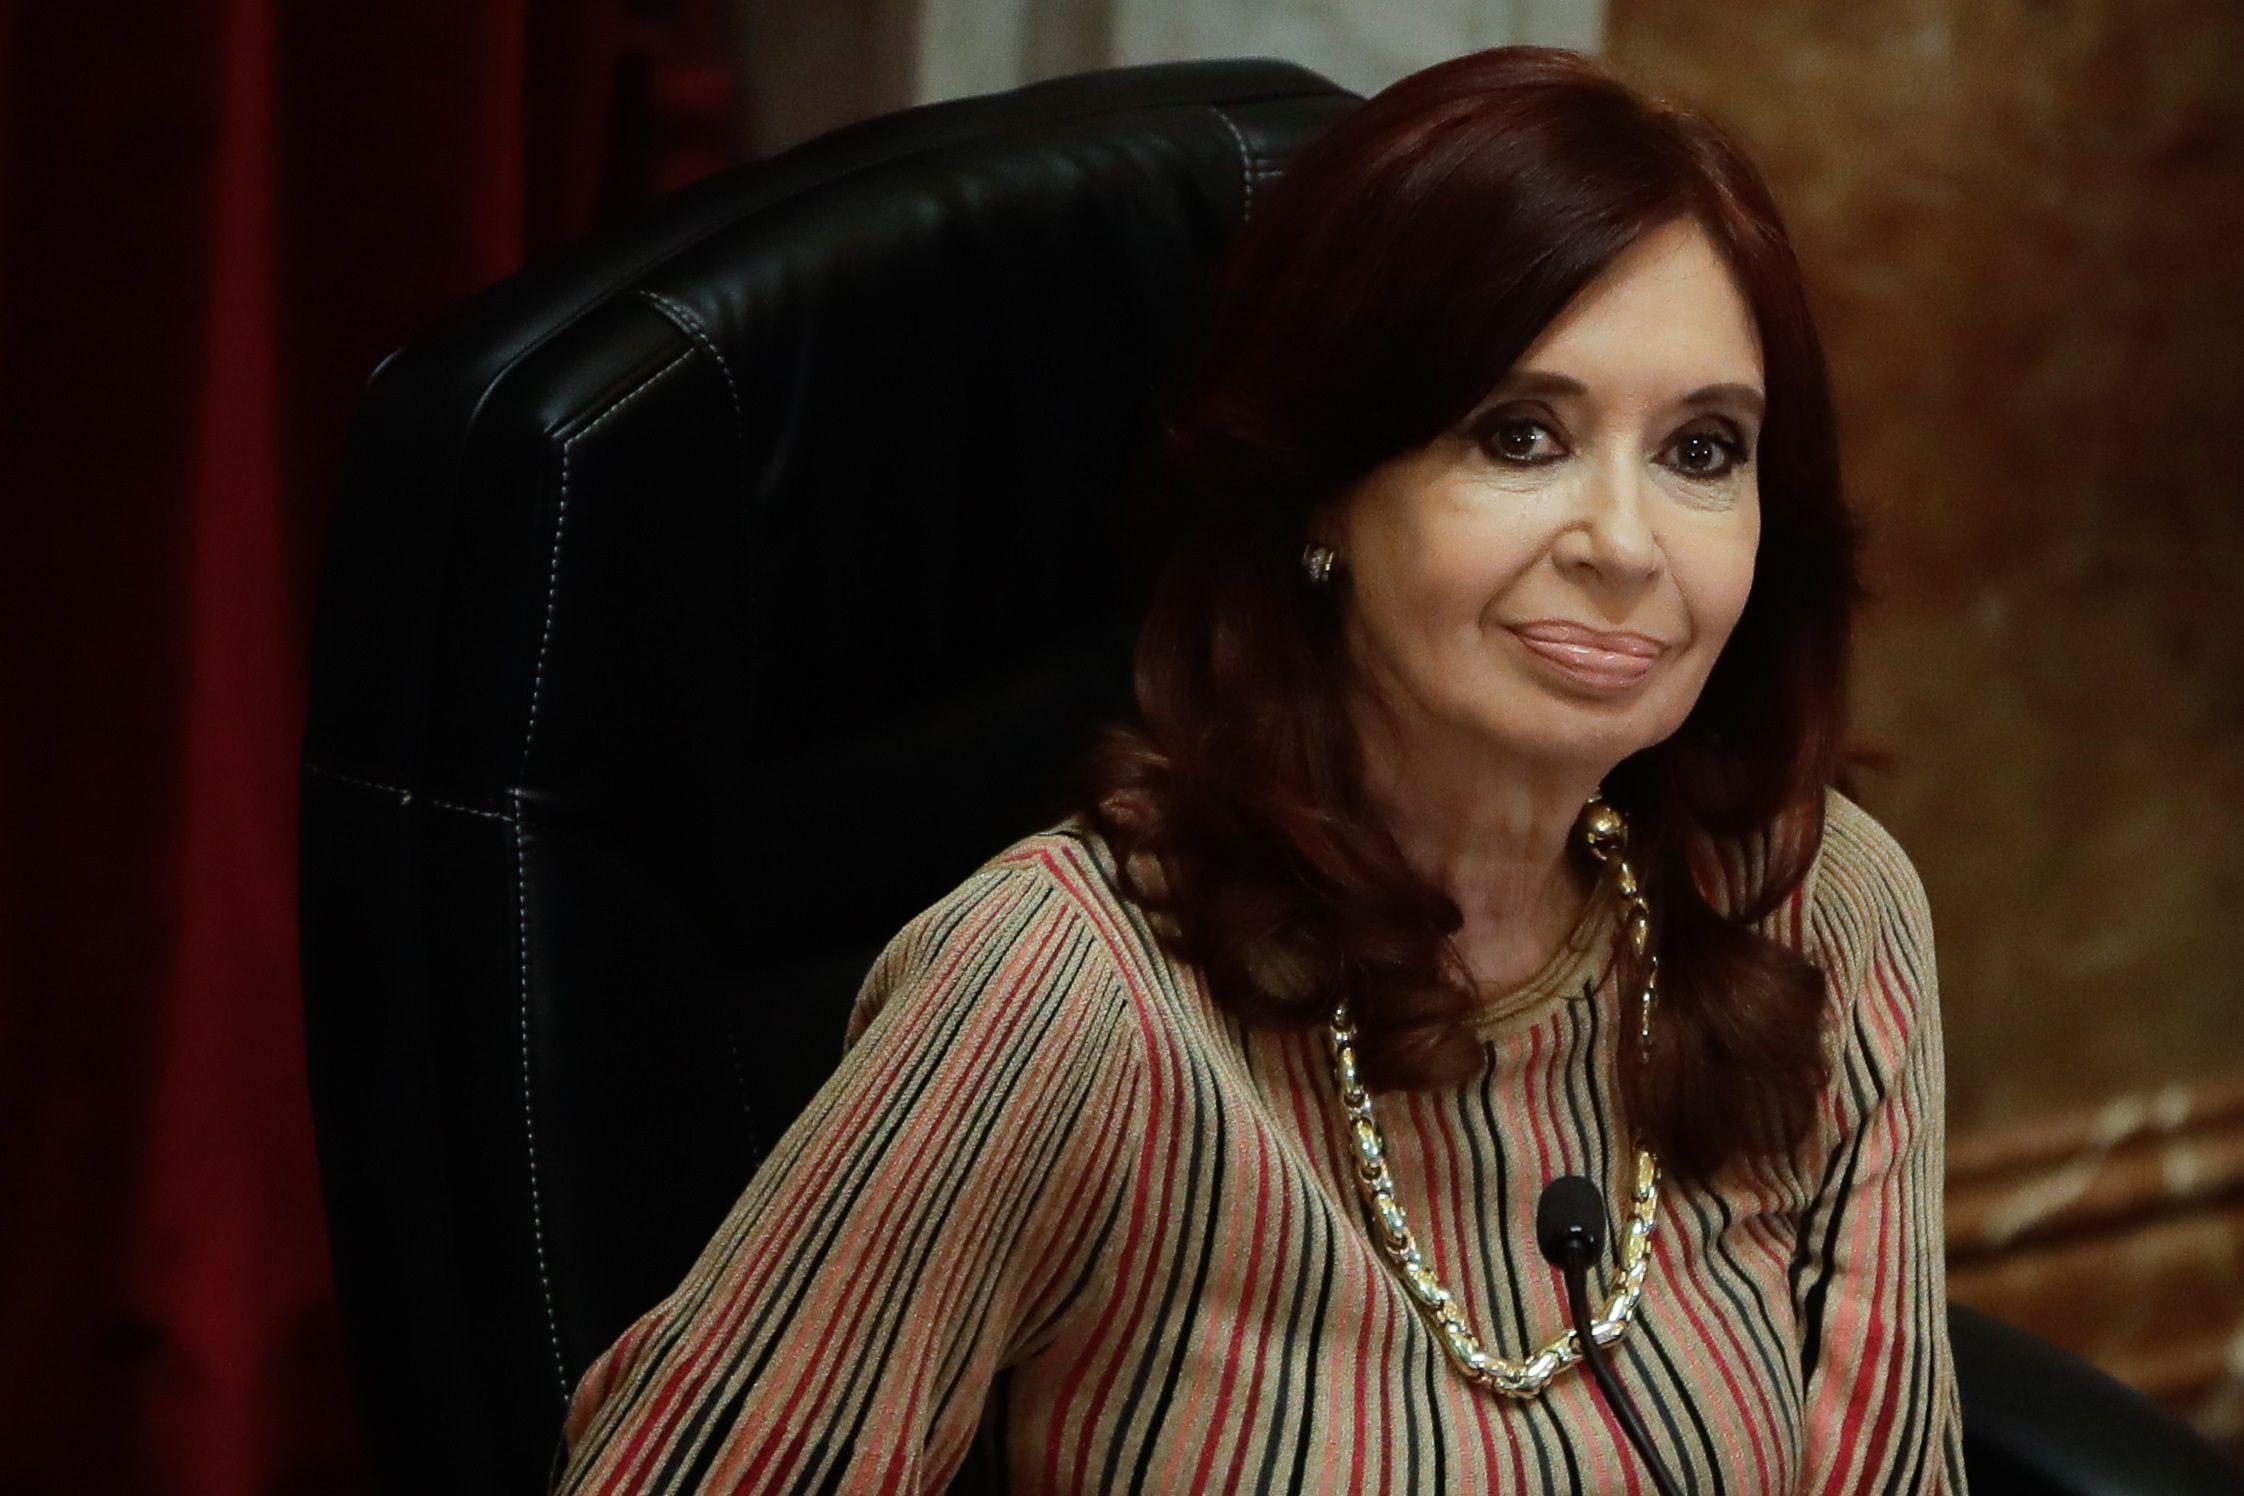 Imagen de archivo de la vicepresidenta de Argentina Cristina Fernández de Kirchner. EFE/Juan Ignacio Roncoroni